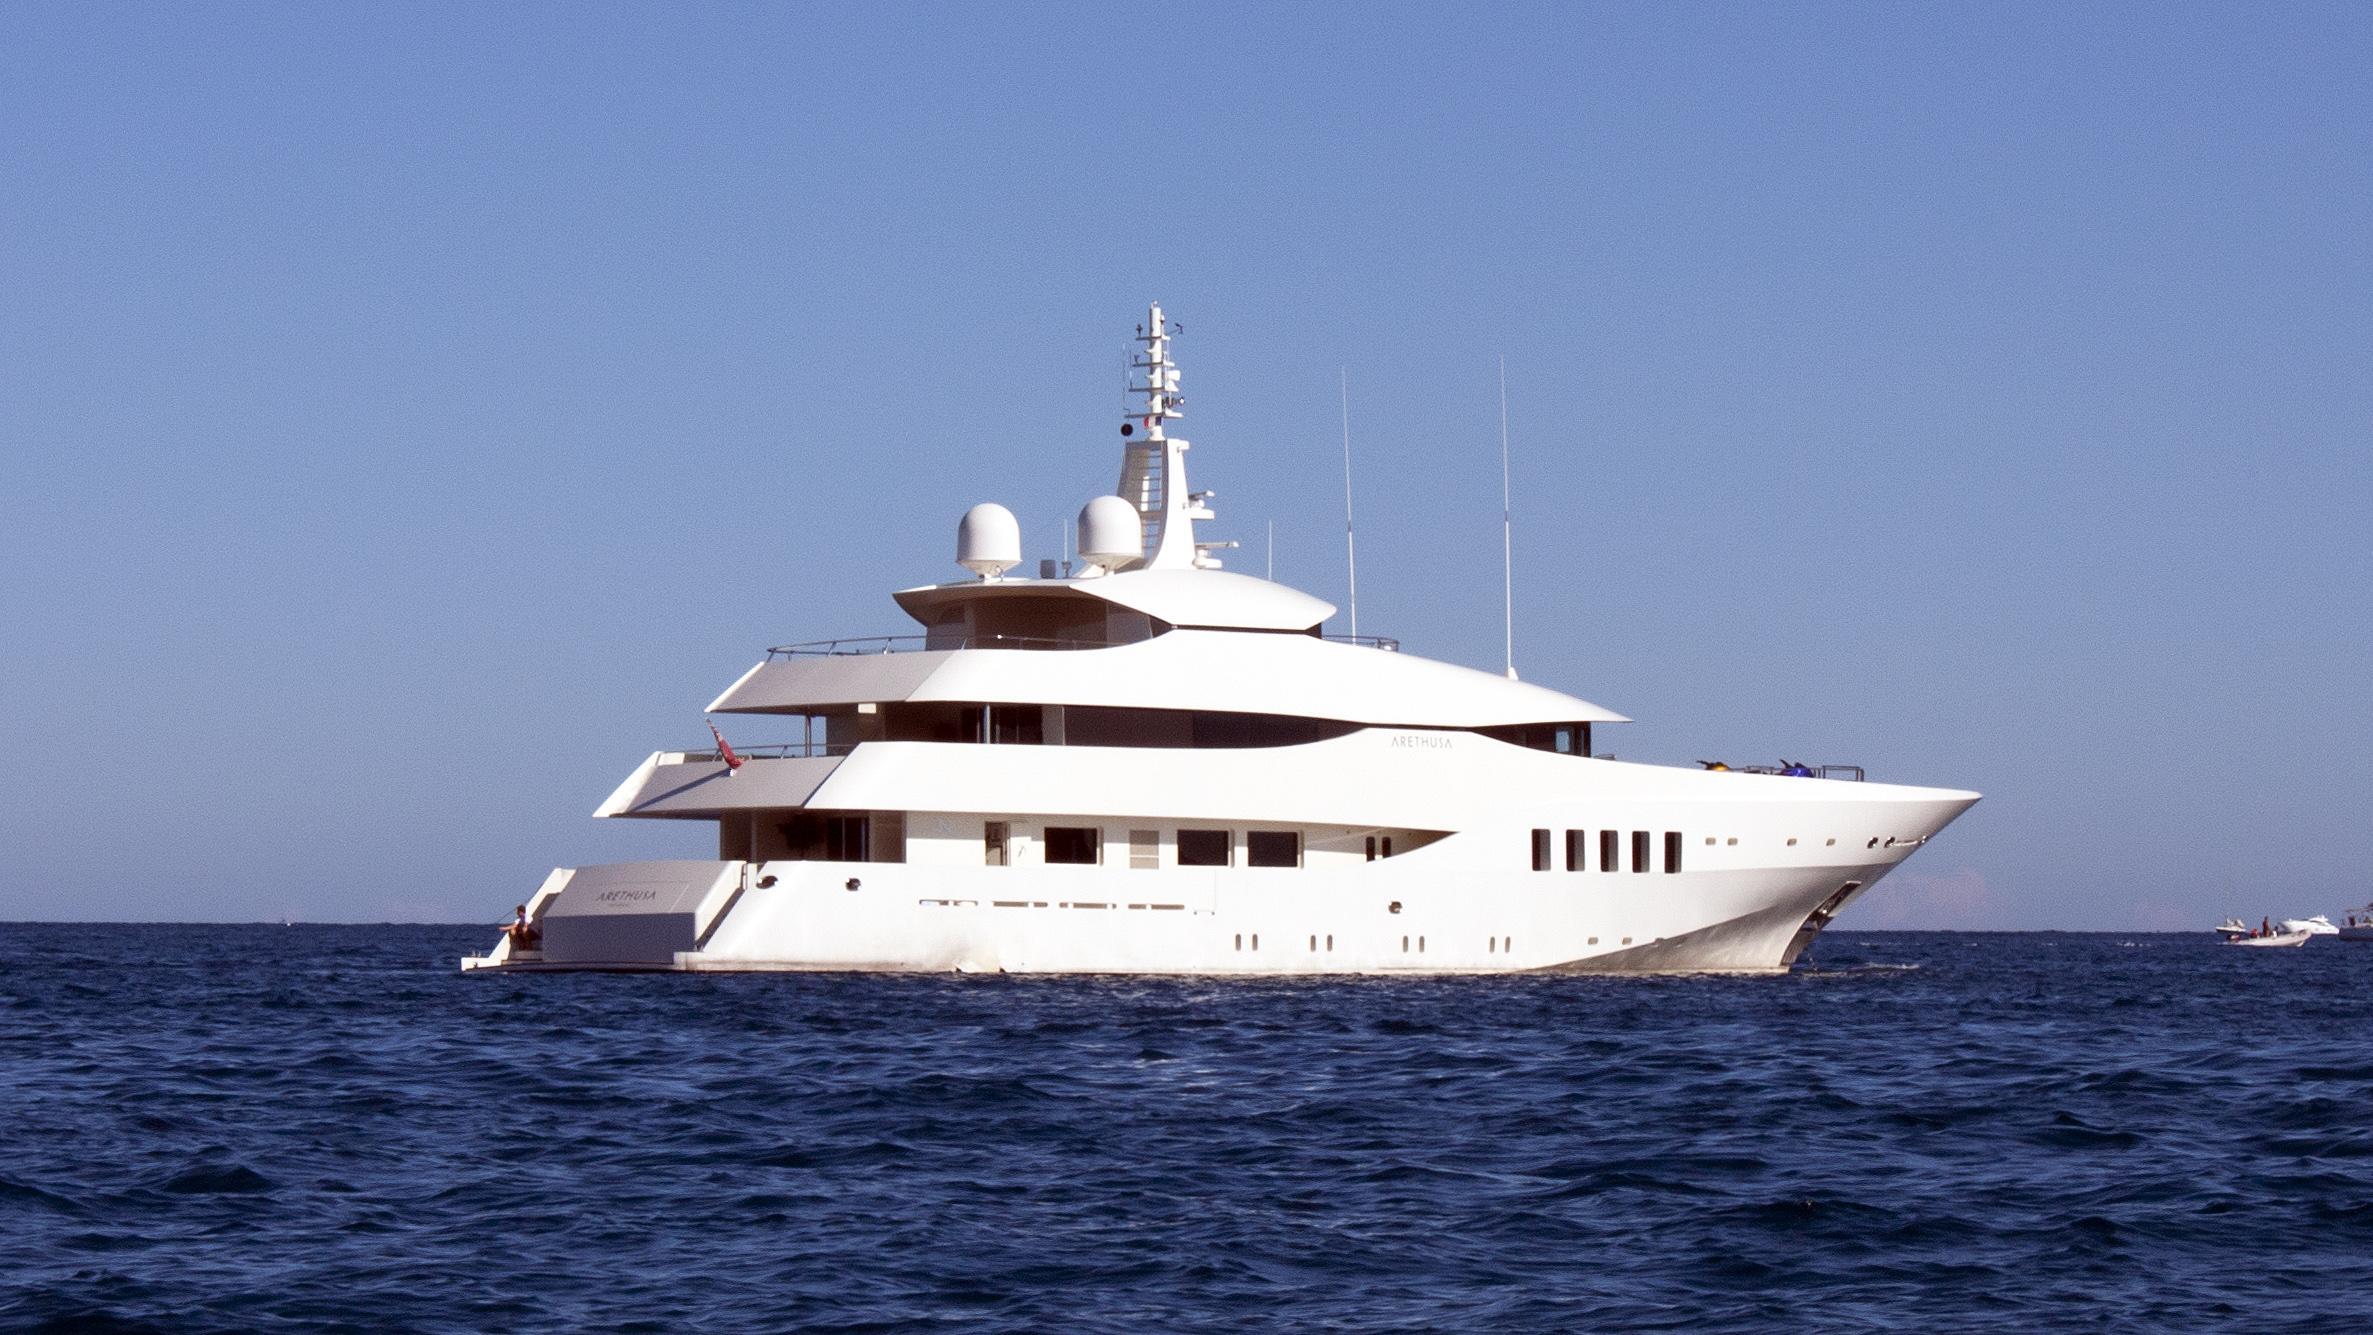 alkhor-motor-yacht-neereids-2008-47m-half-profile